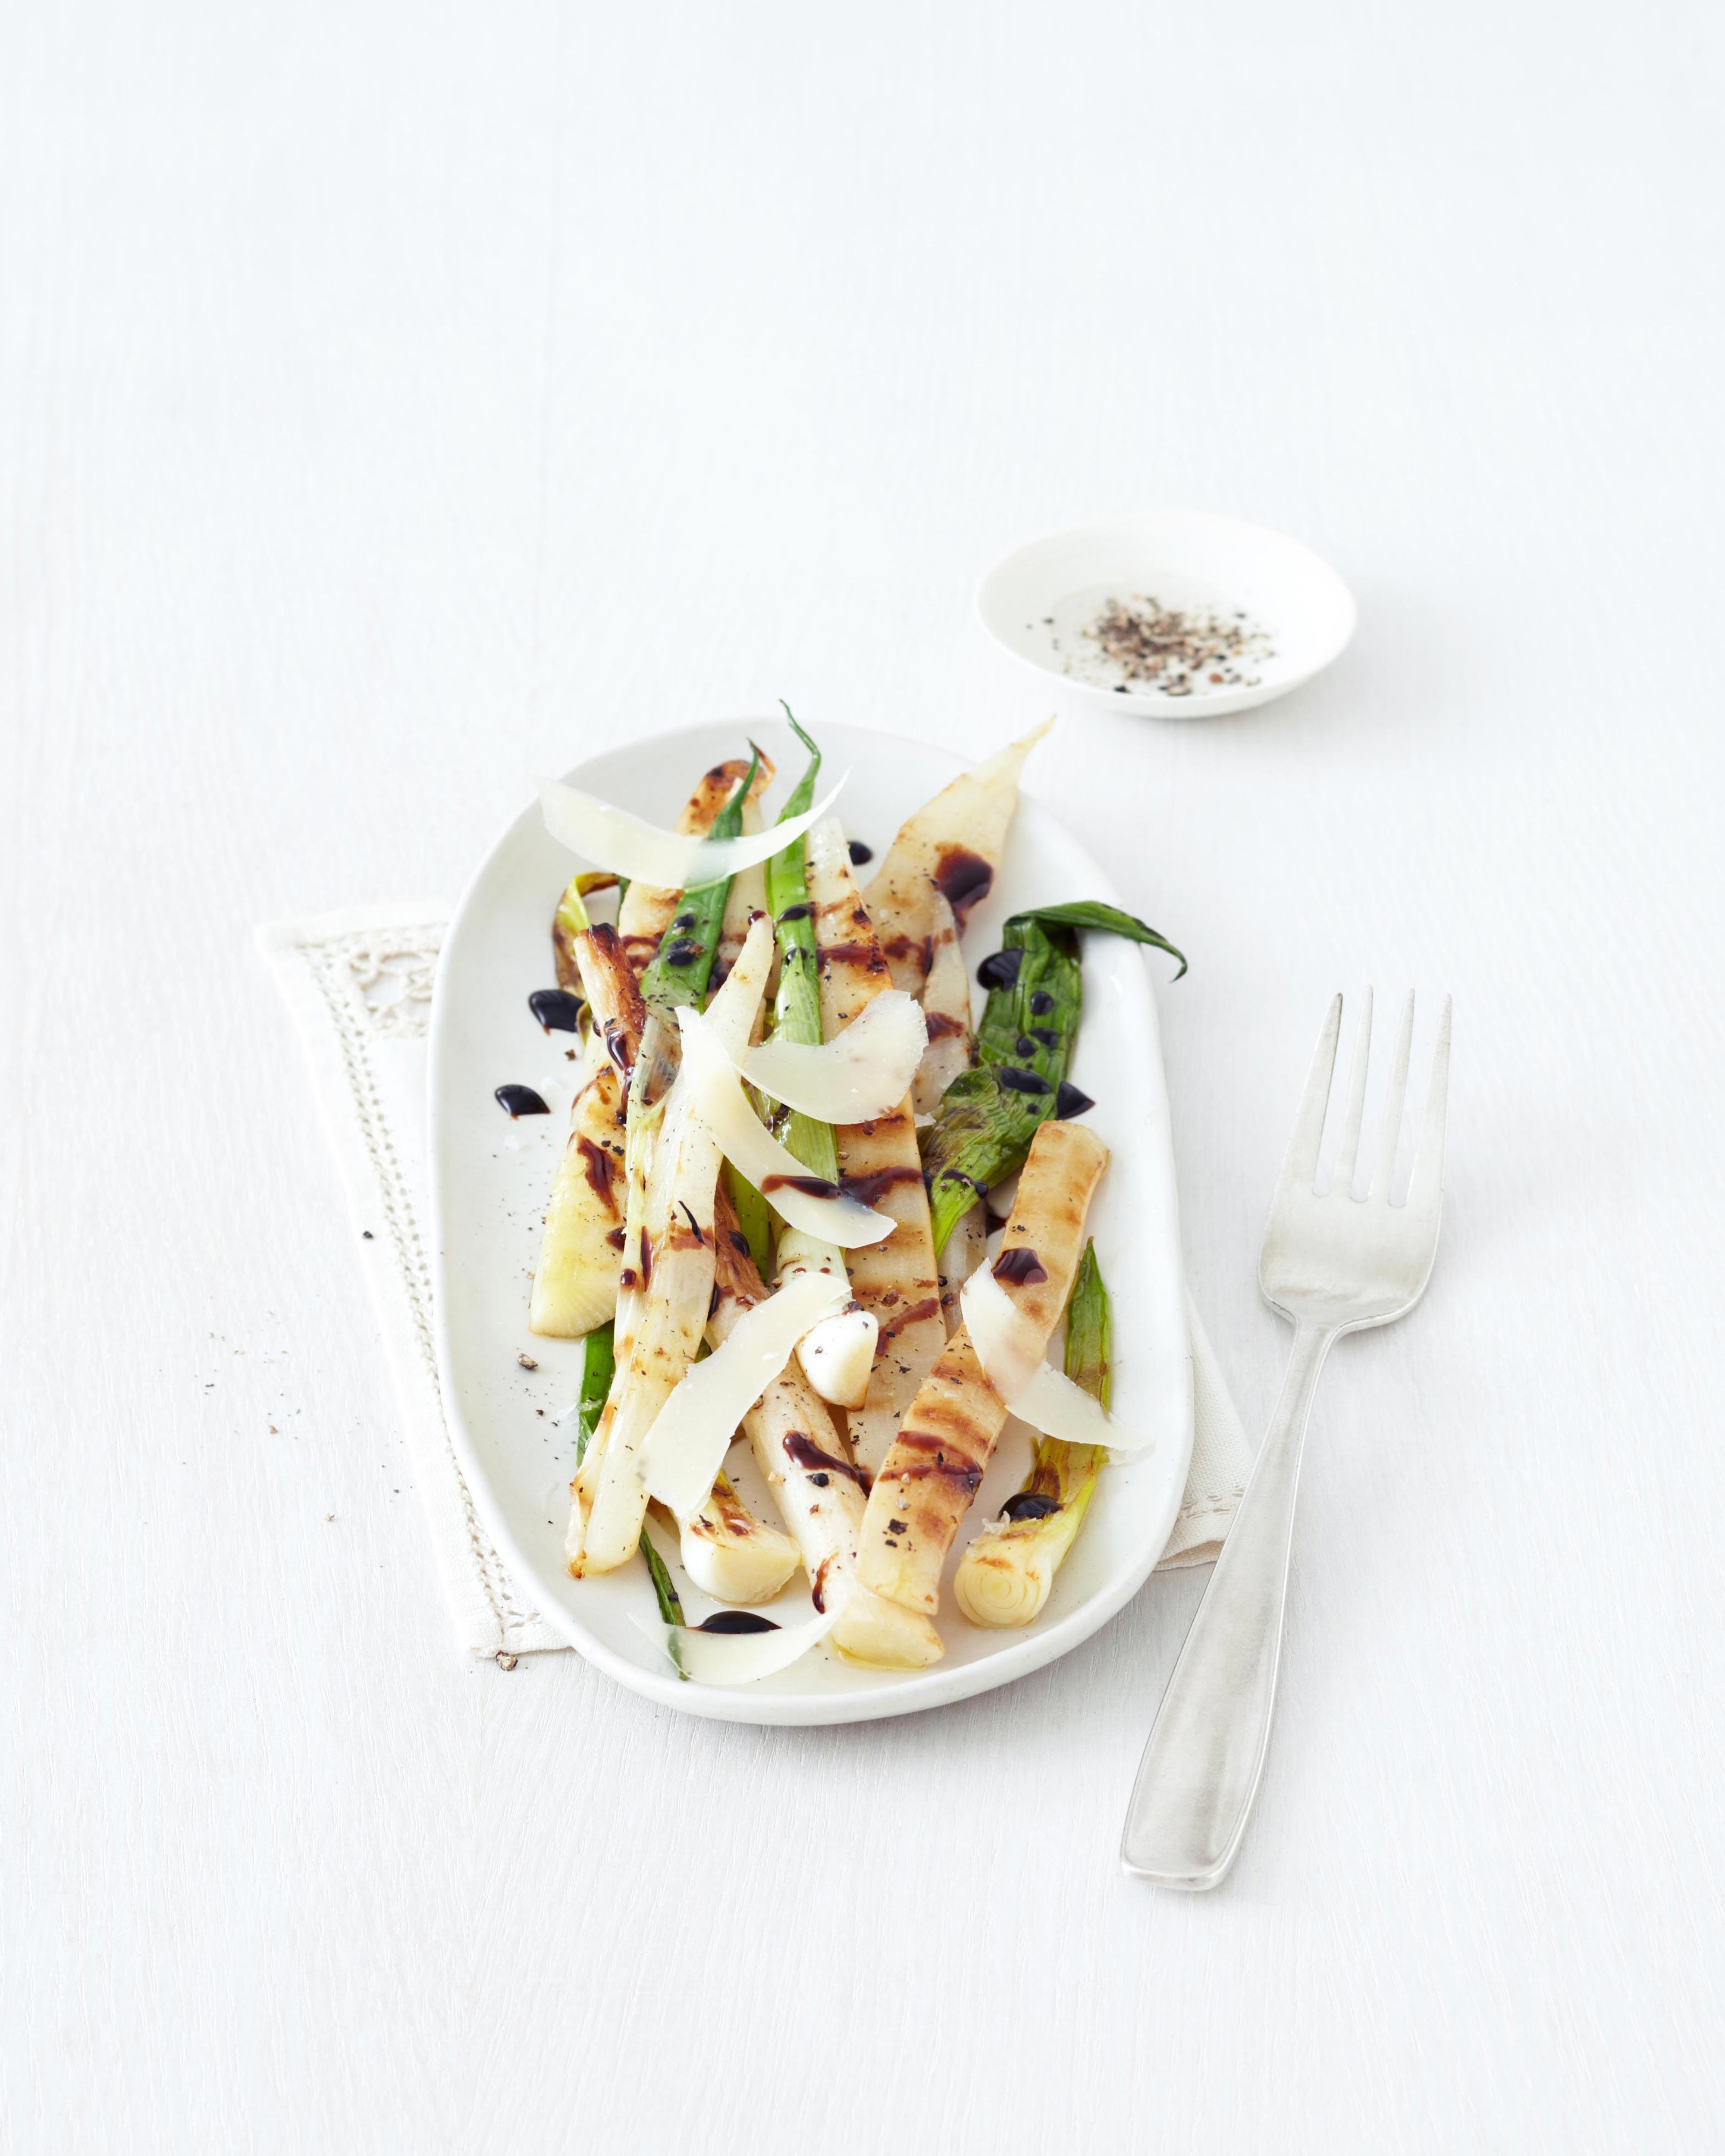 Weißkohl, Sauerkraut & Spitzkohl - 20 Rezepte - [LIVING AT HOME]